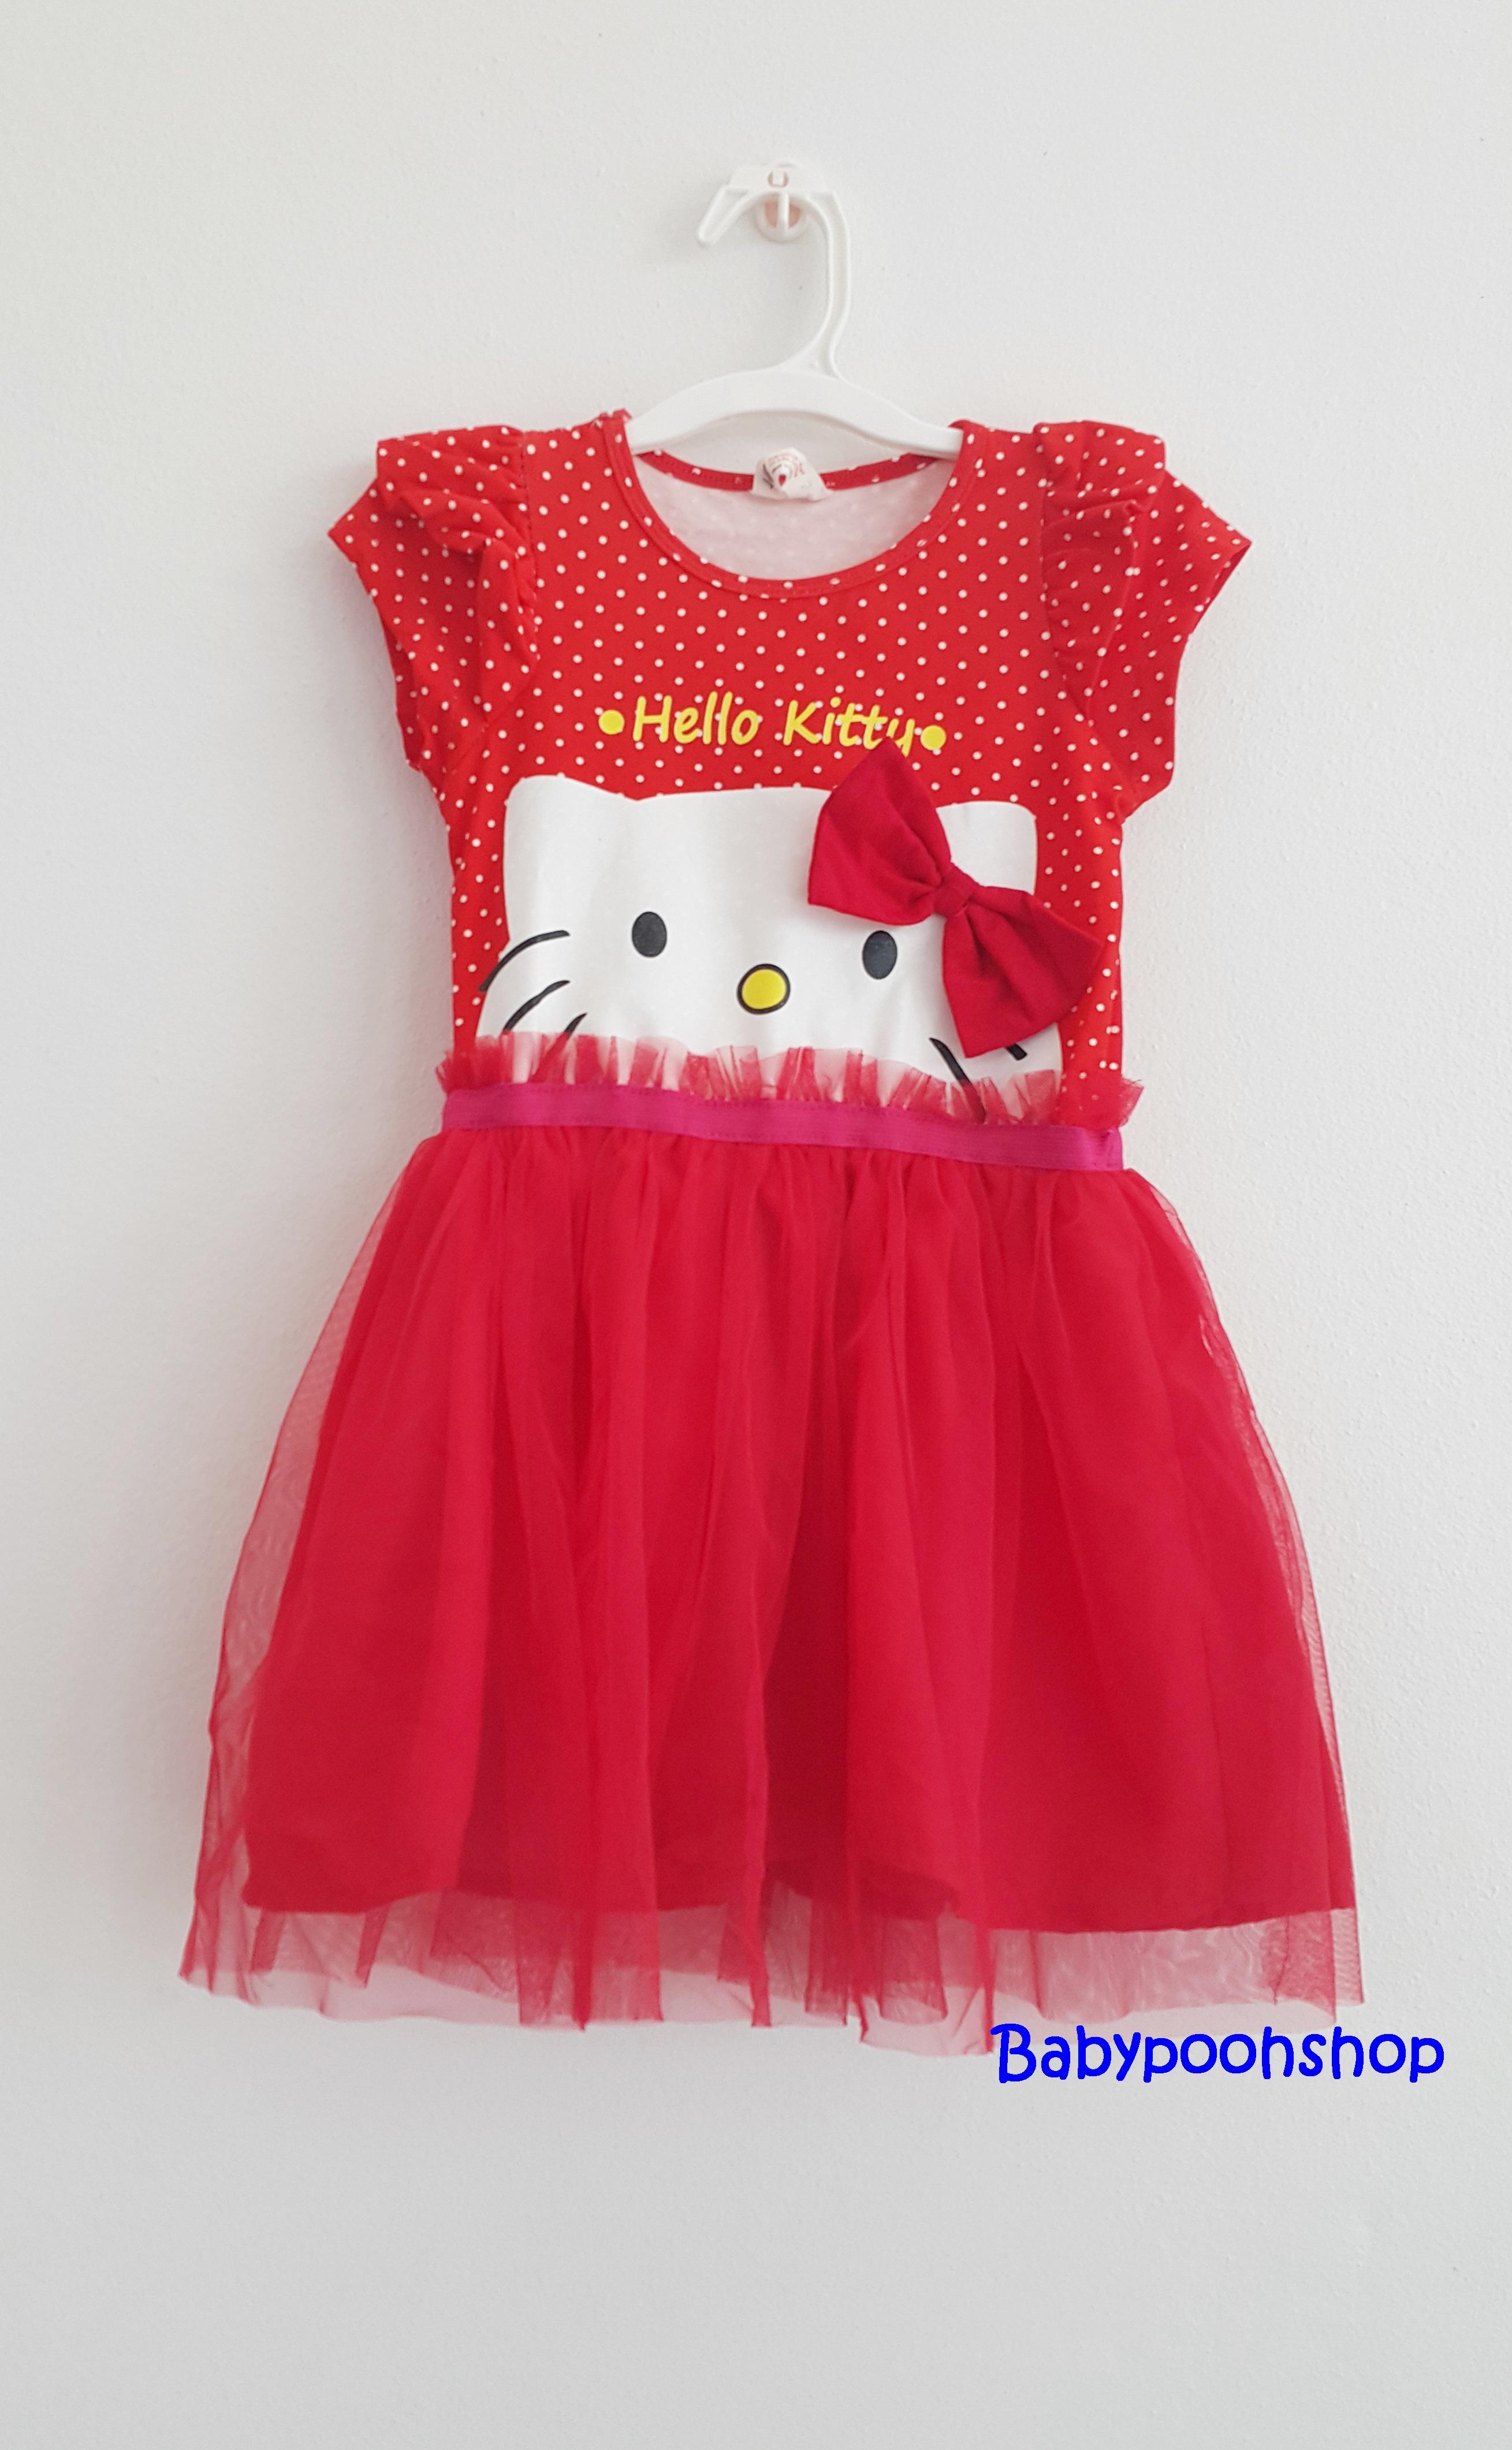 H&M : เดรส สกรีนลาย หน้า Hello Kitty กระโปรงตาข่าย สีแดง (งานติดป้ายผิด) size : 1-2y / 2-4y